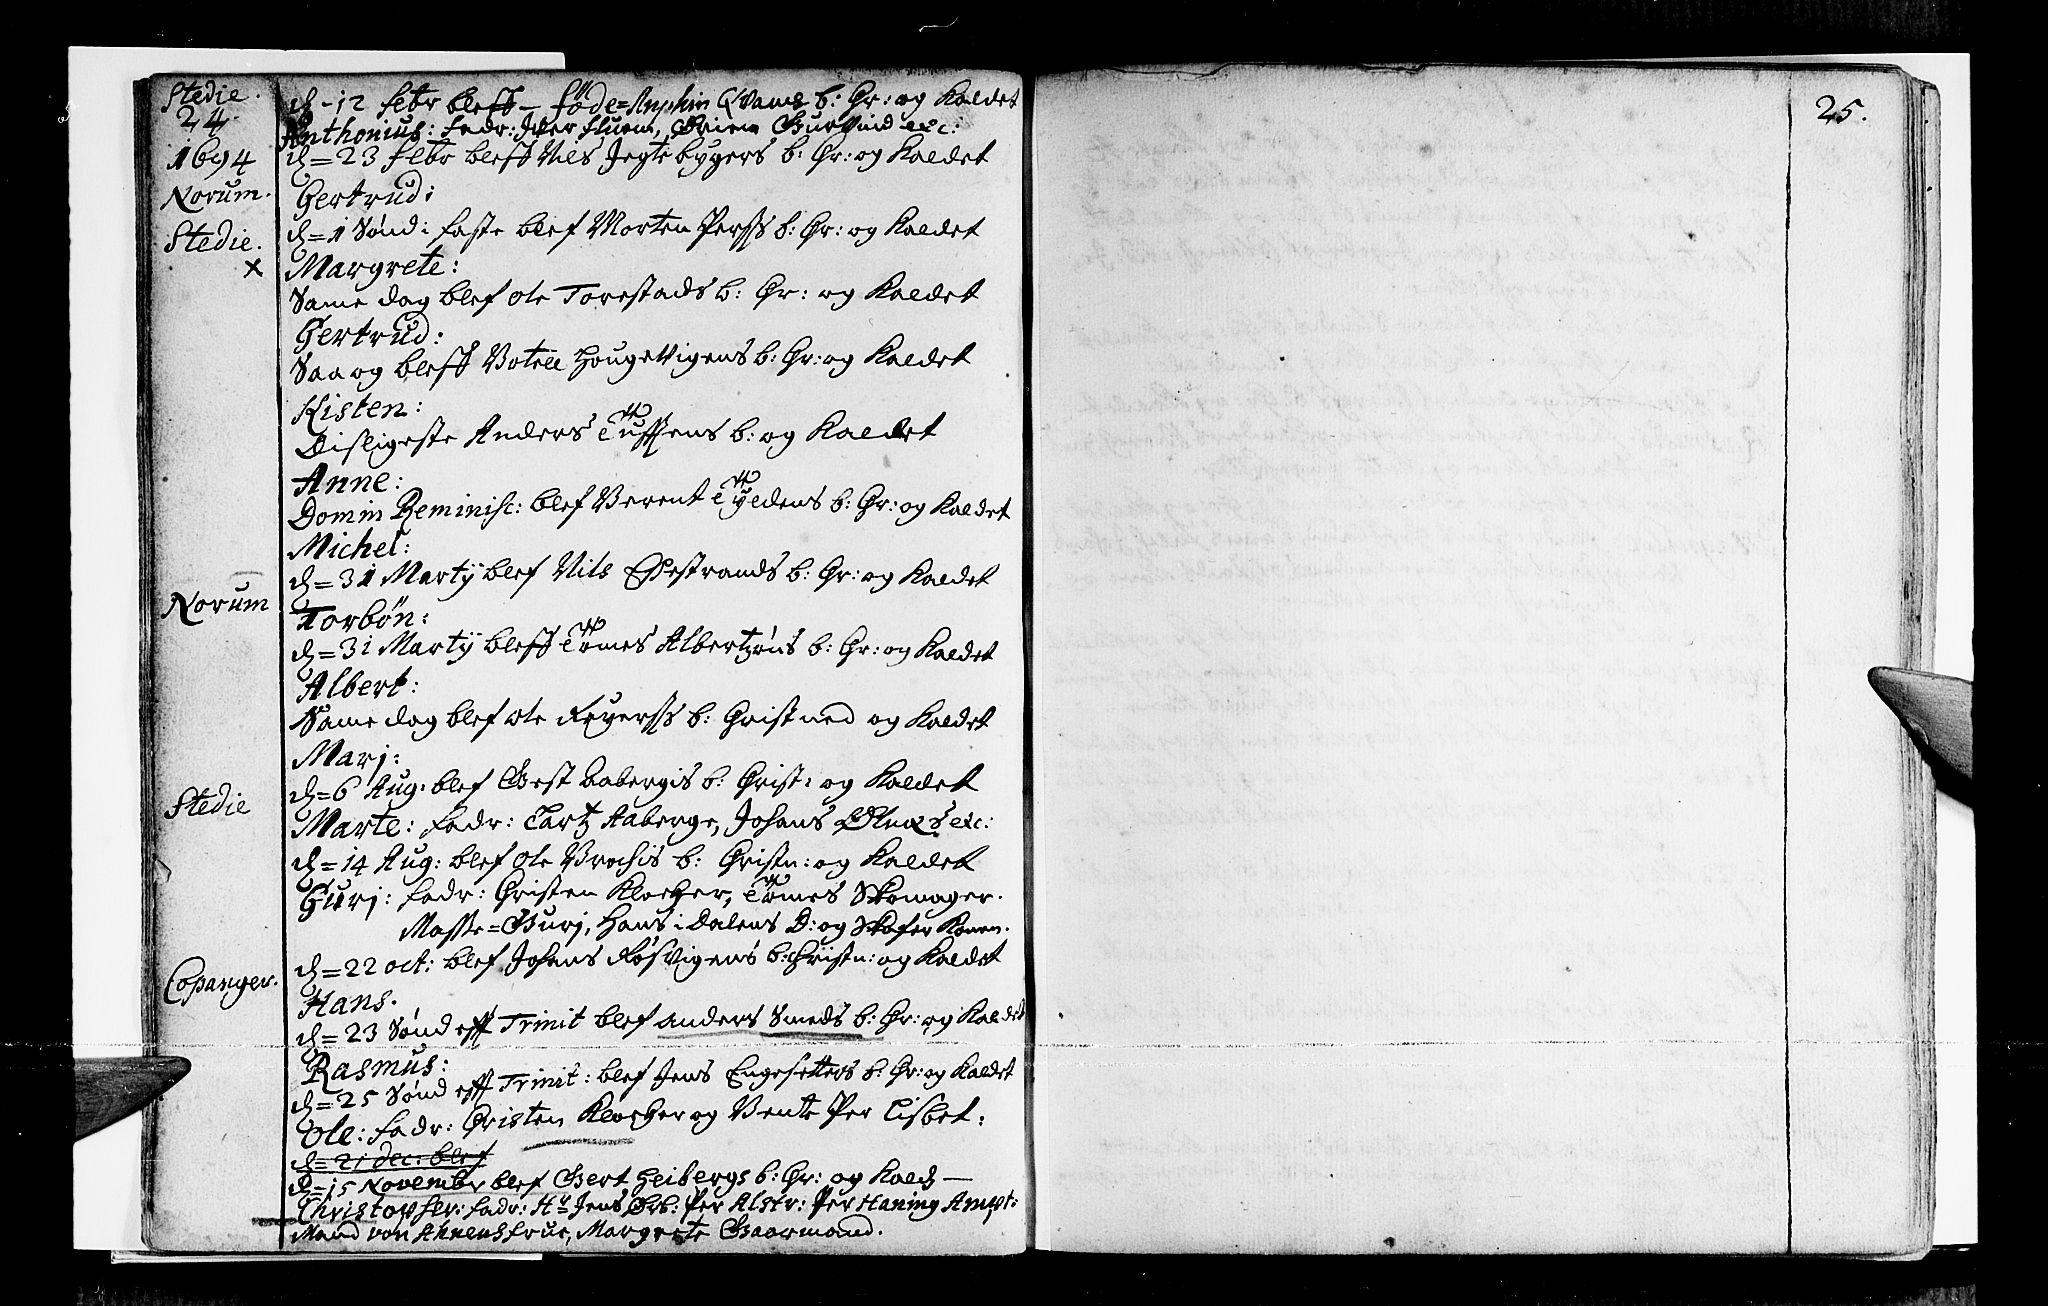 SAB, Sogndal sokneprestembete, H/Haa/Haaa/L0001: Ministerialbok nr. A 1, 1689-1713, s. 24-25